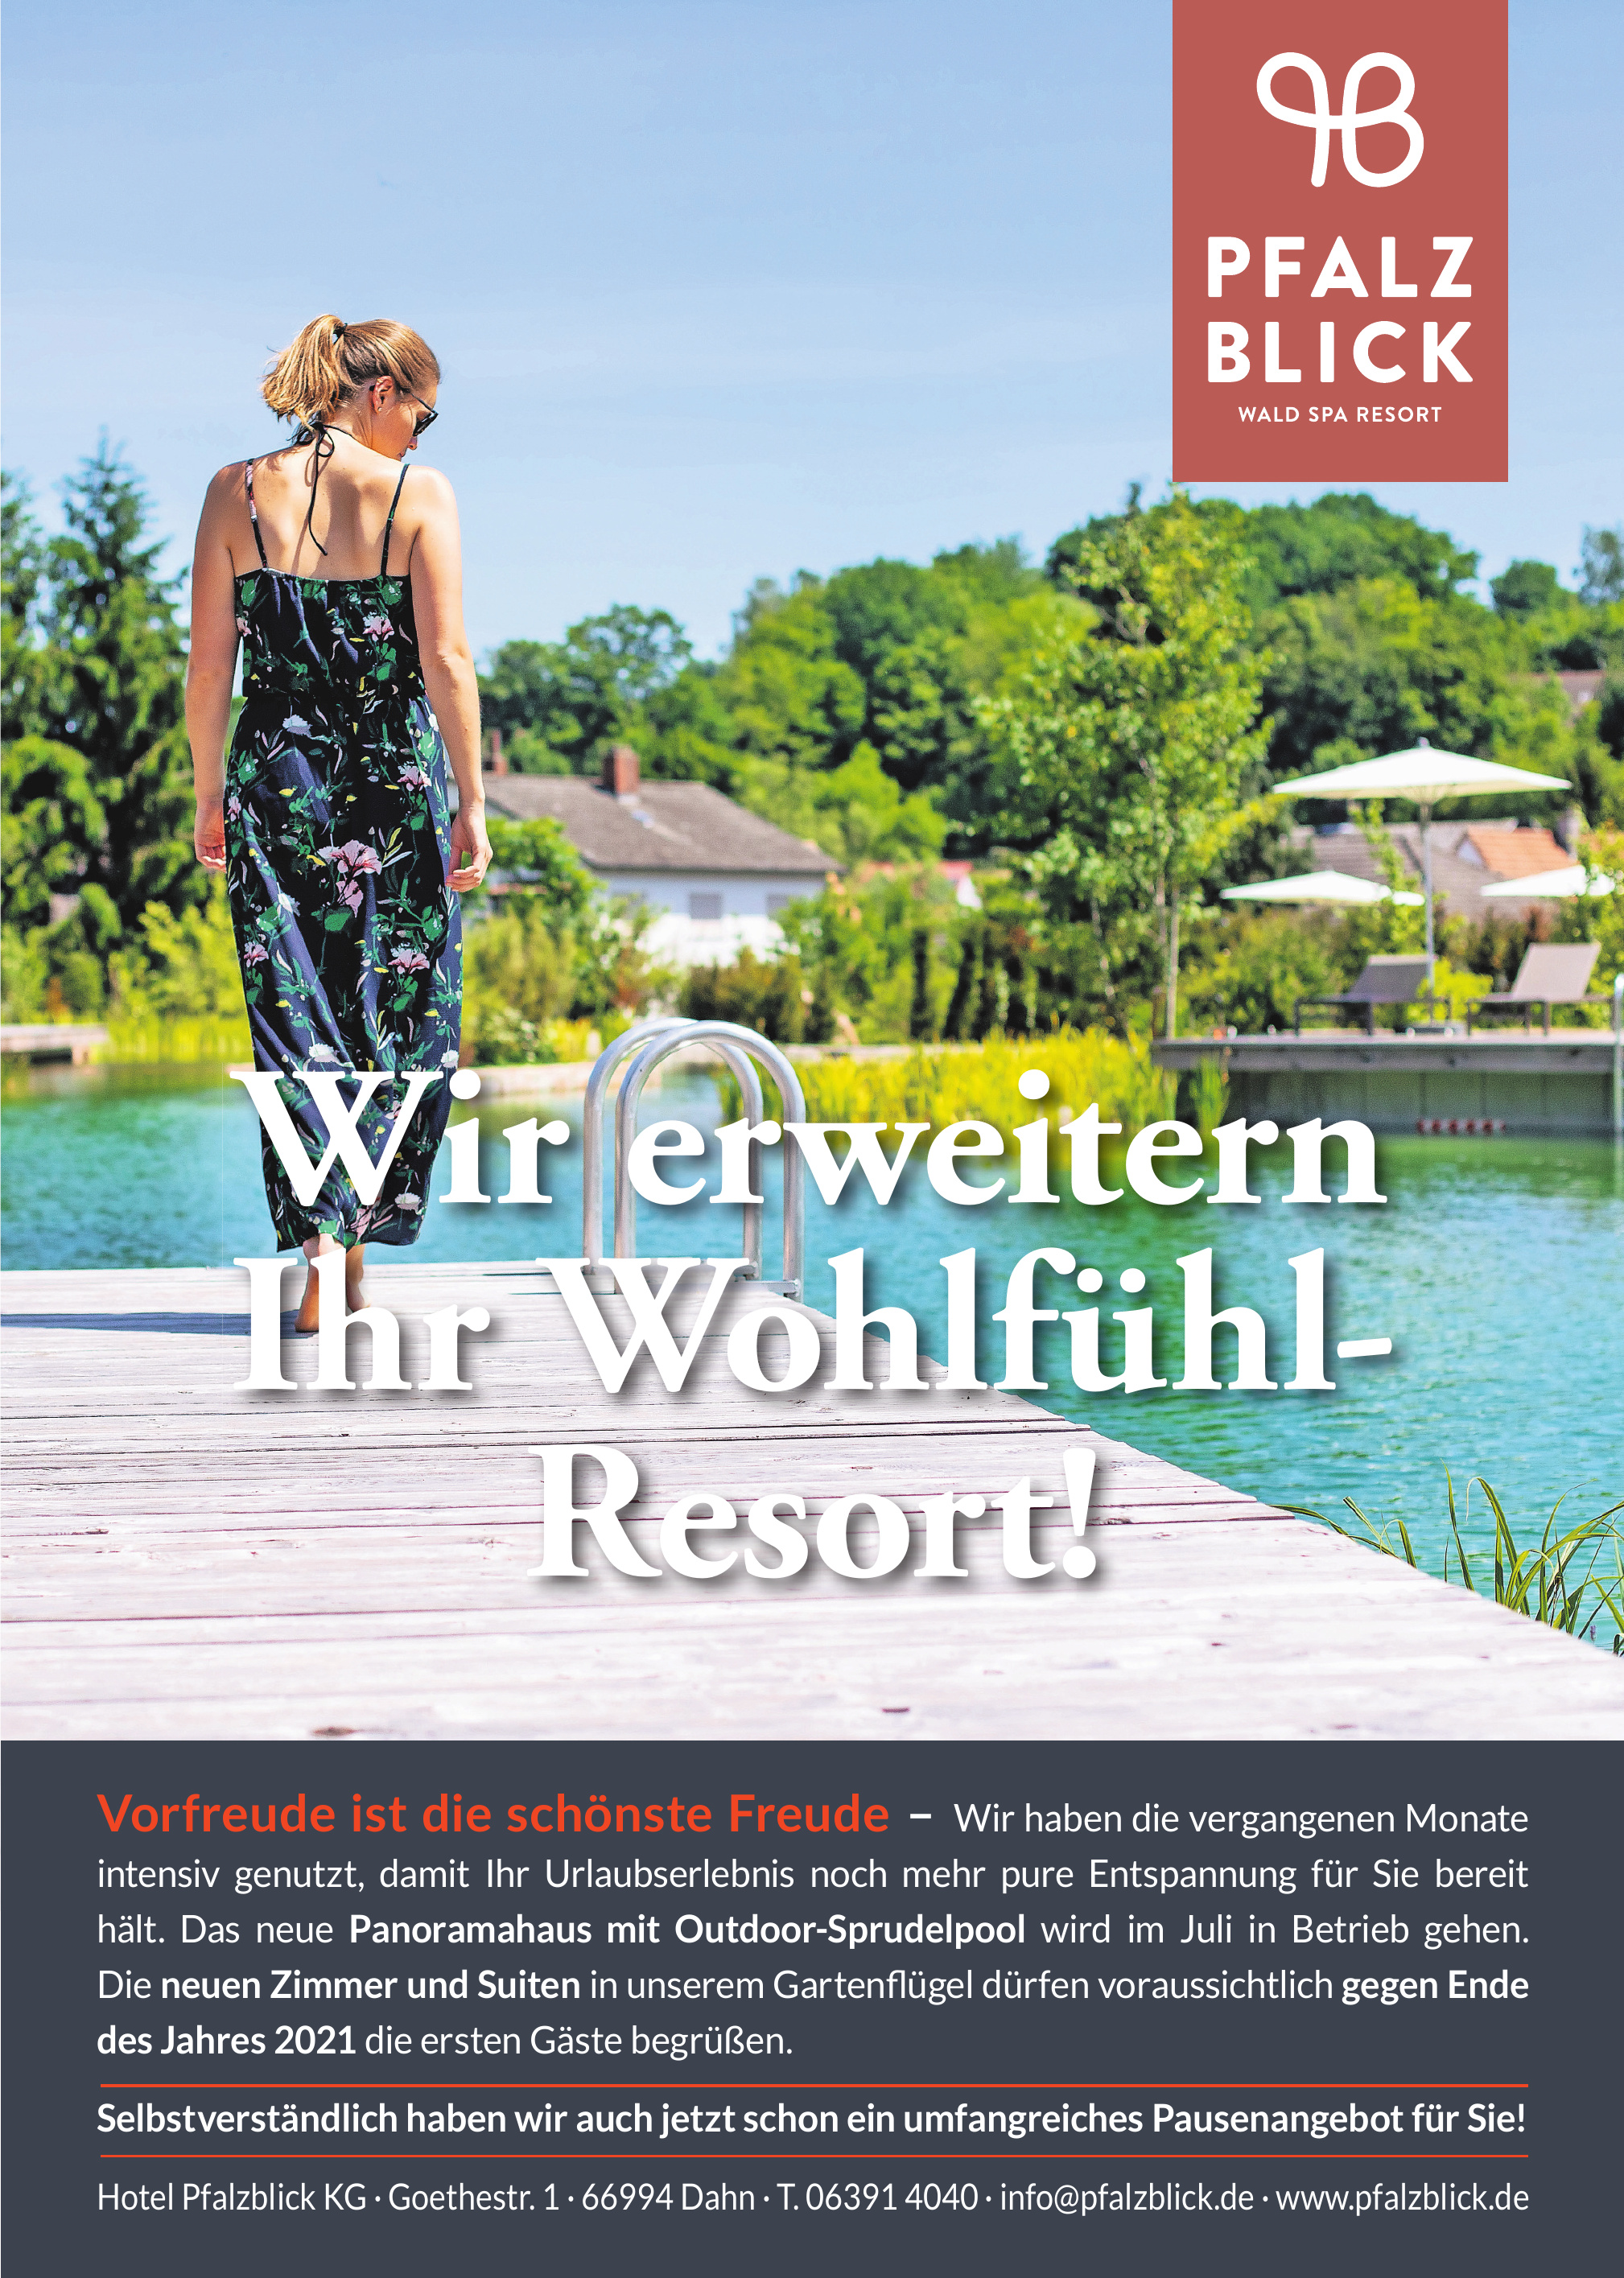 Hotel Pfalzblick KG